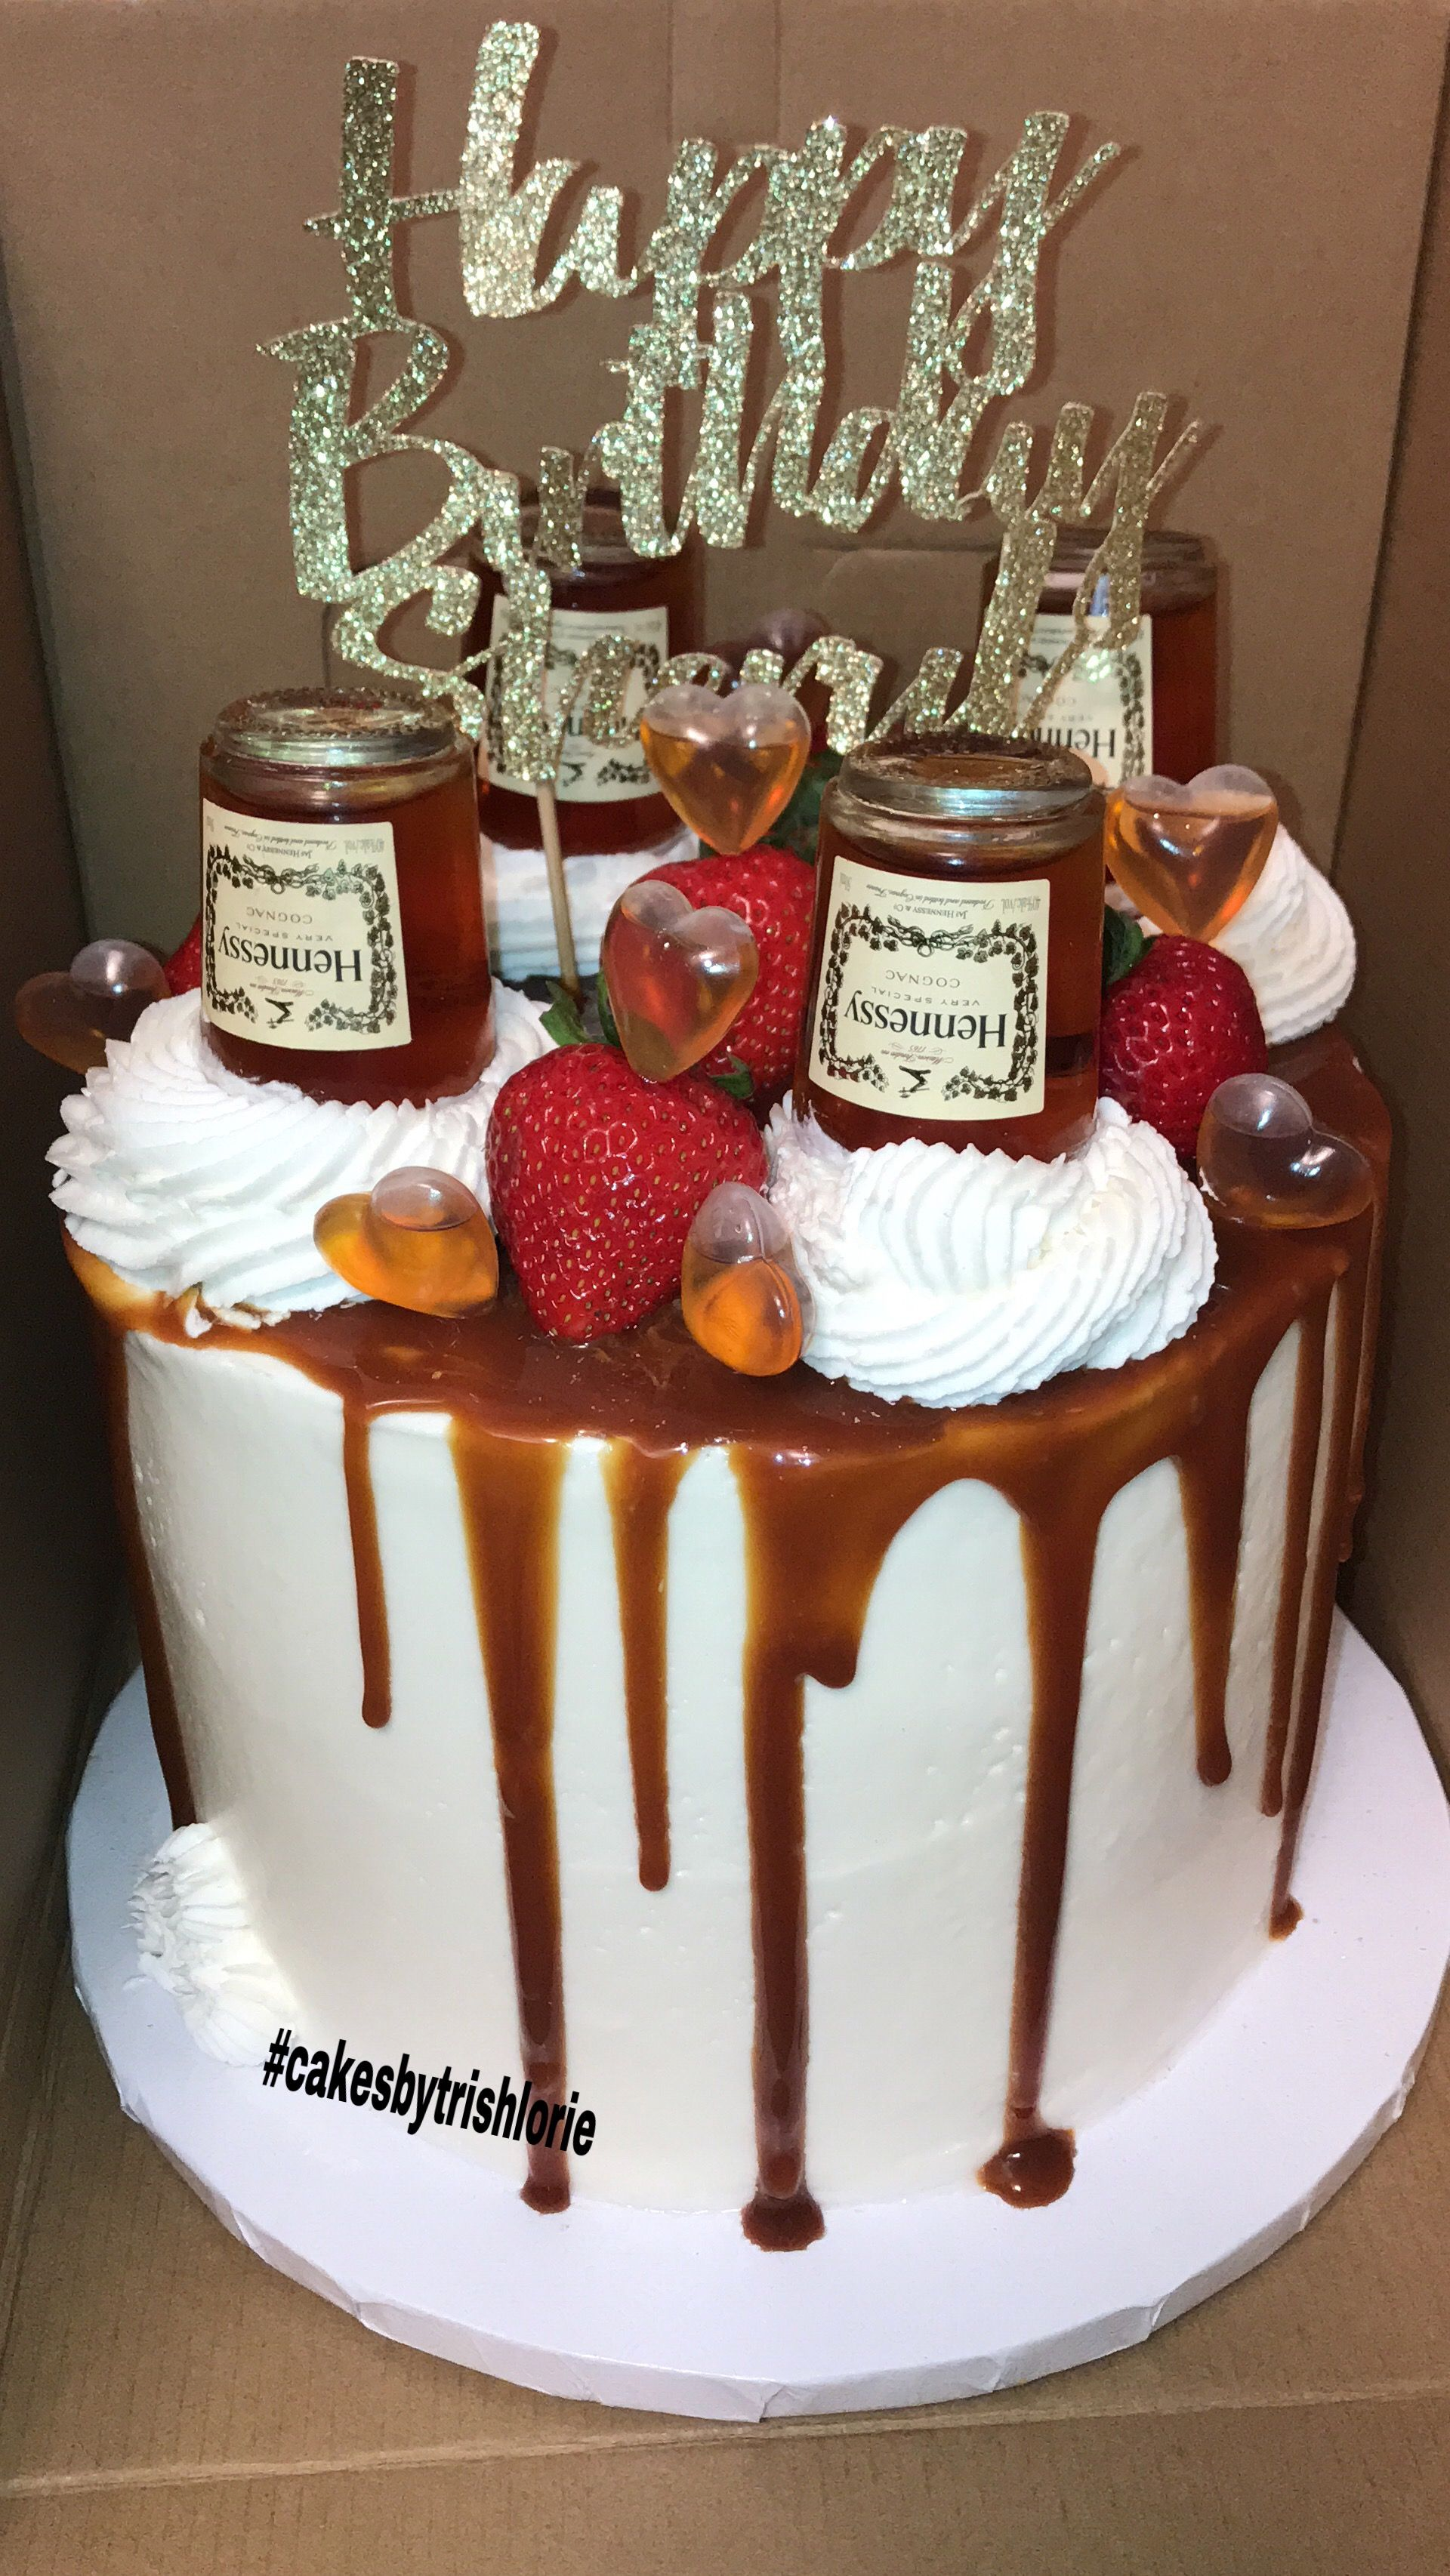 Excellent Hennessy Drip Cake 21St Birthday Cakes Adult Birthday Cakes Funny Birthday Cards Online Elaedamsfinfo